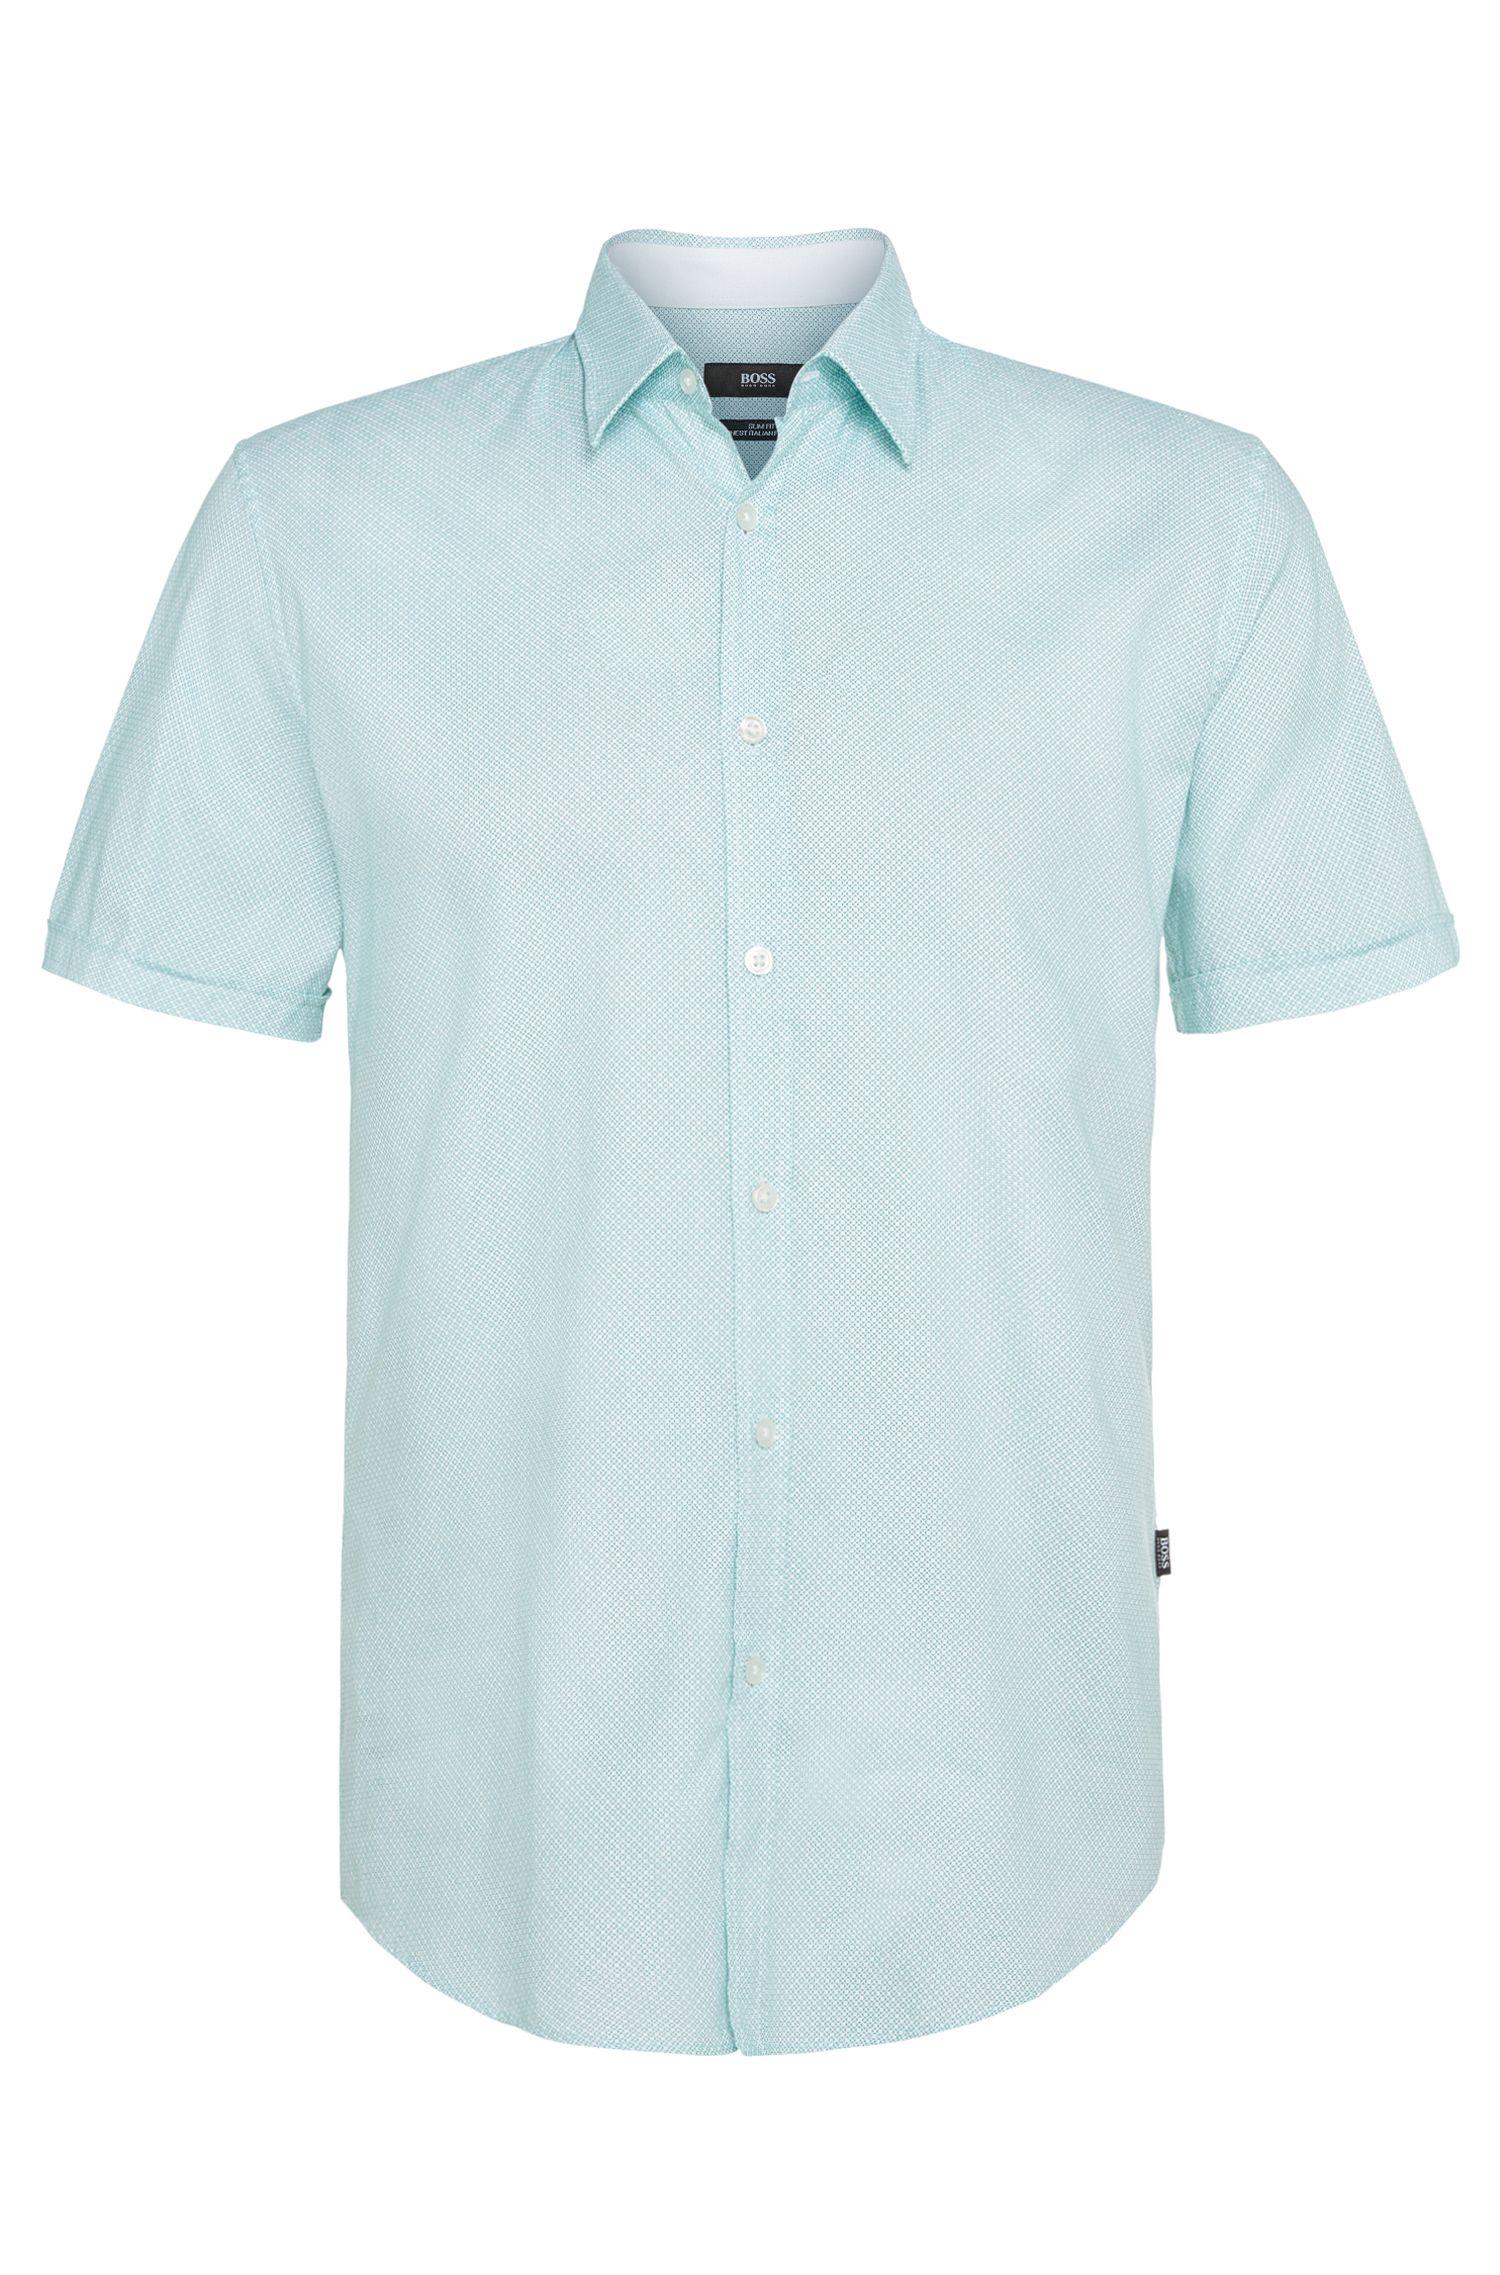 'Ronn' | Slim Fit, Italian Cotton Oxford Button Down Shirt